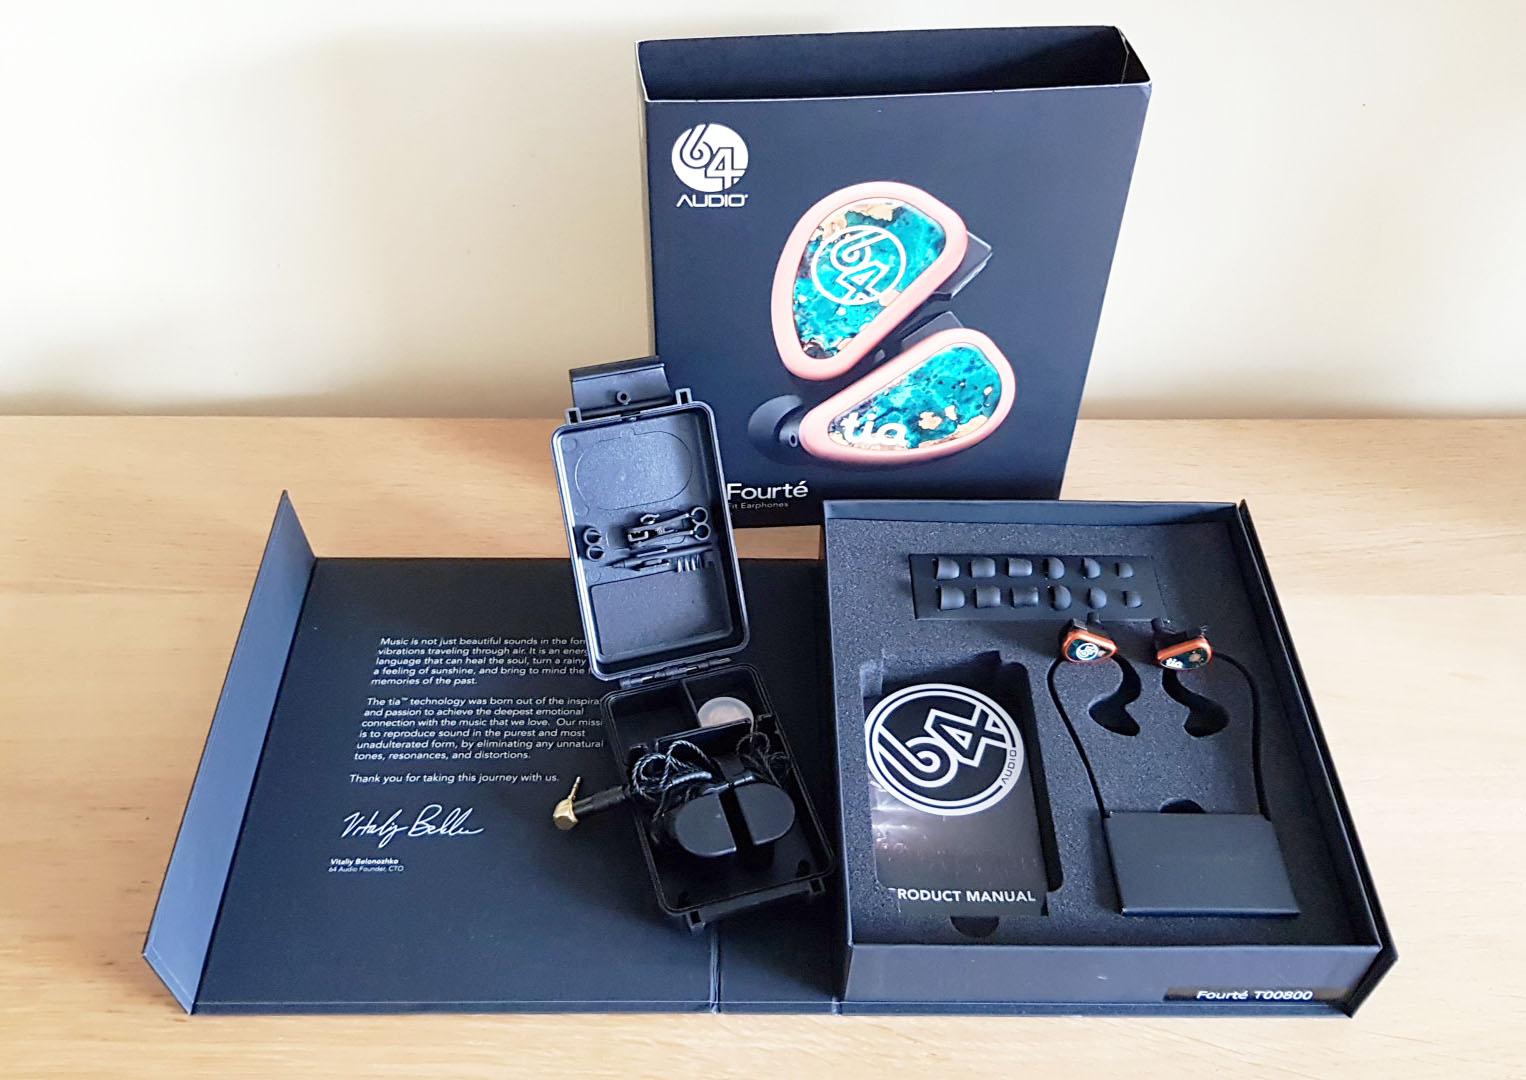 64 Audio Tia Fourté In-Ear Monitors - Like New